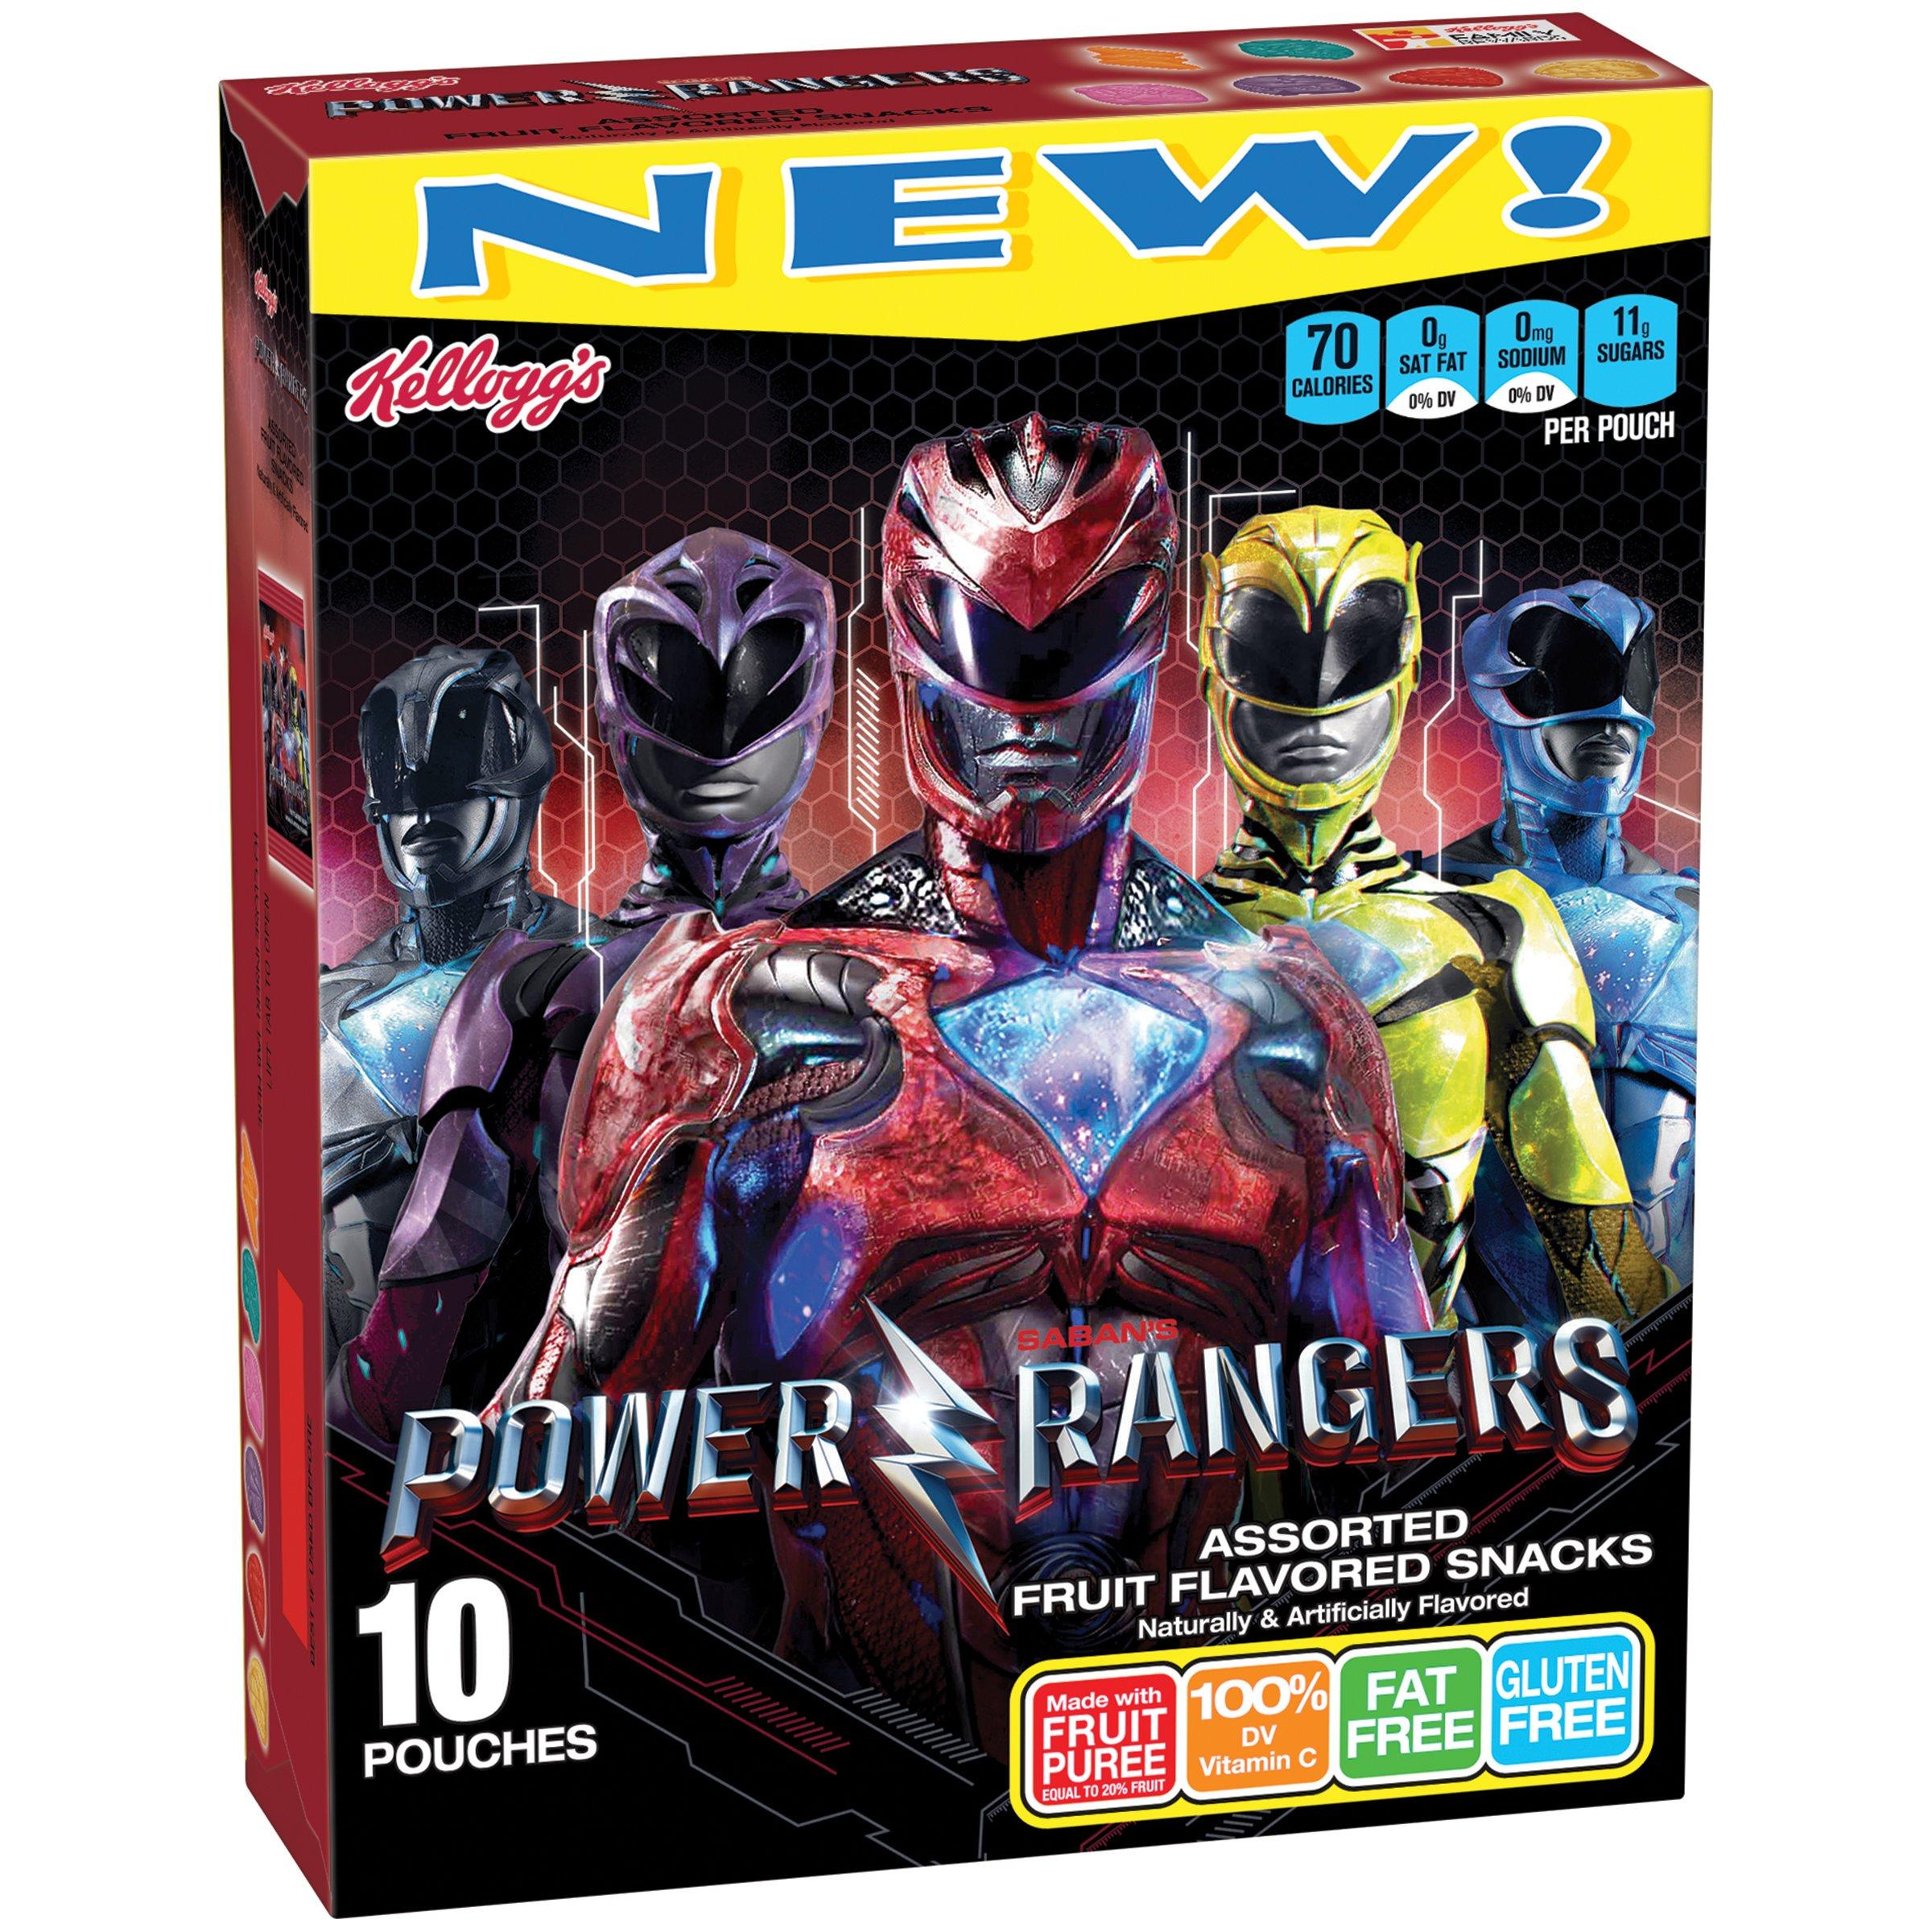 Kellogg's Power Rangers Fruit Flavored Snacks, 10 Count, 8 Ounce